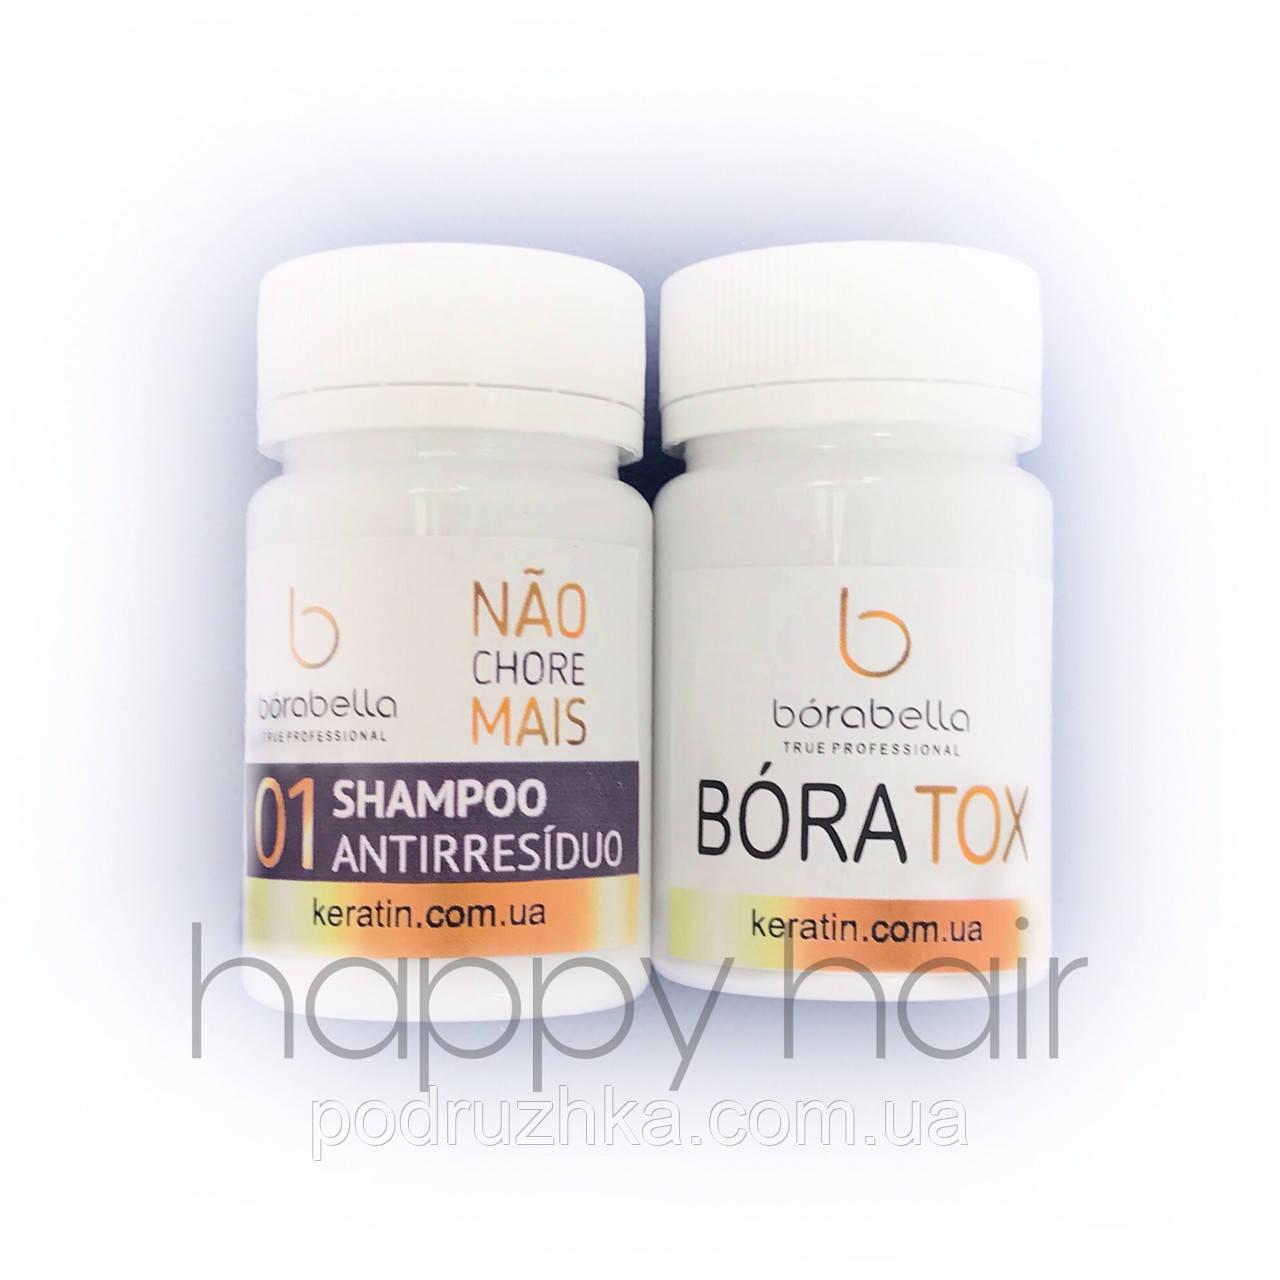 Borabella Organic Boratox Набор ботекс для волос 30/50 г